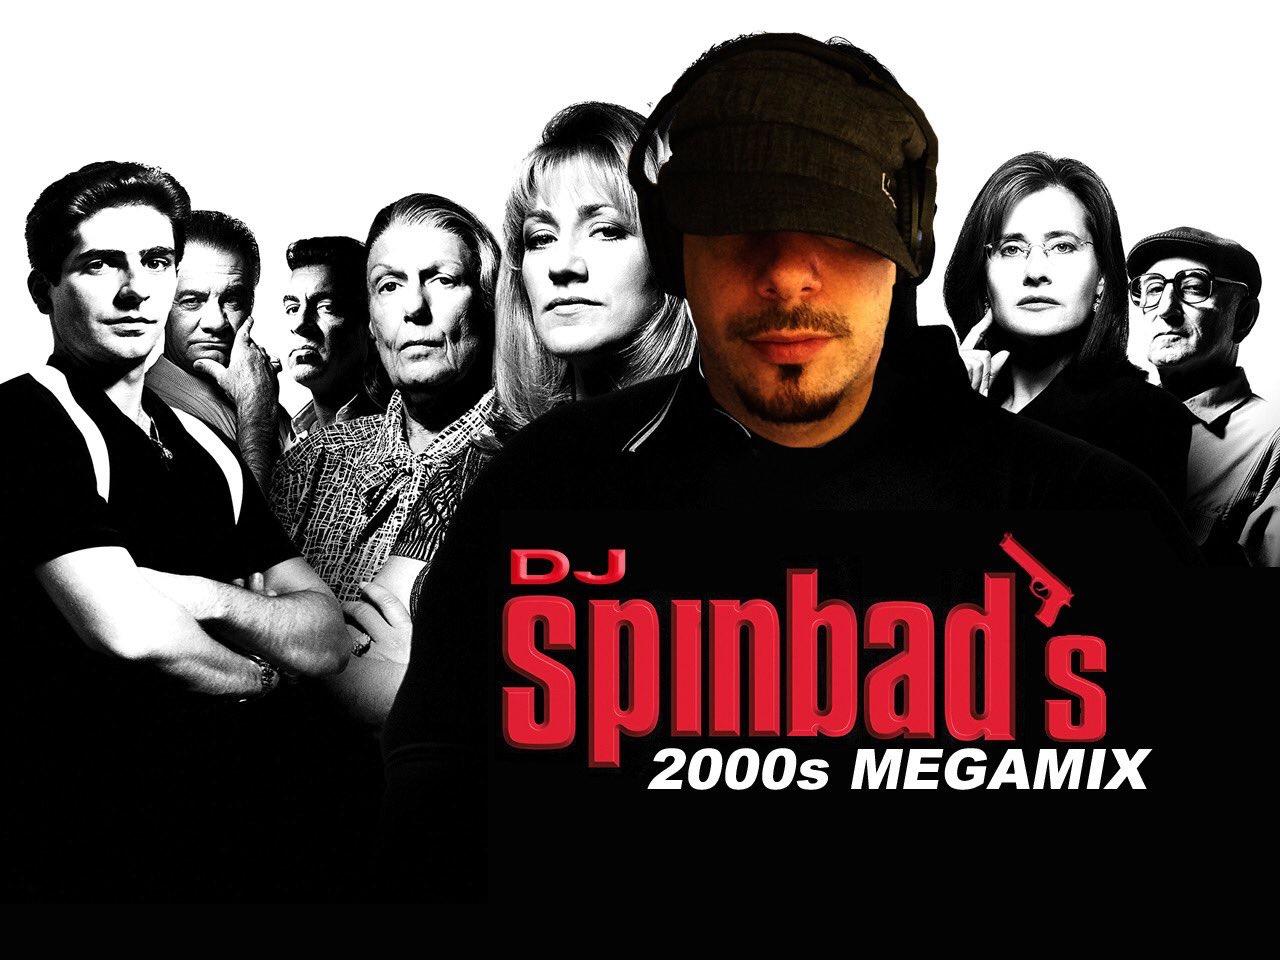 DJ Spinbad 2000s Megamix